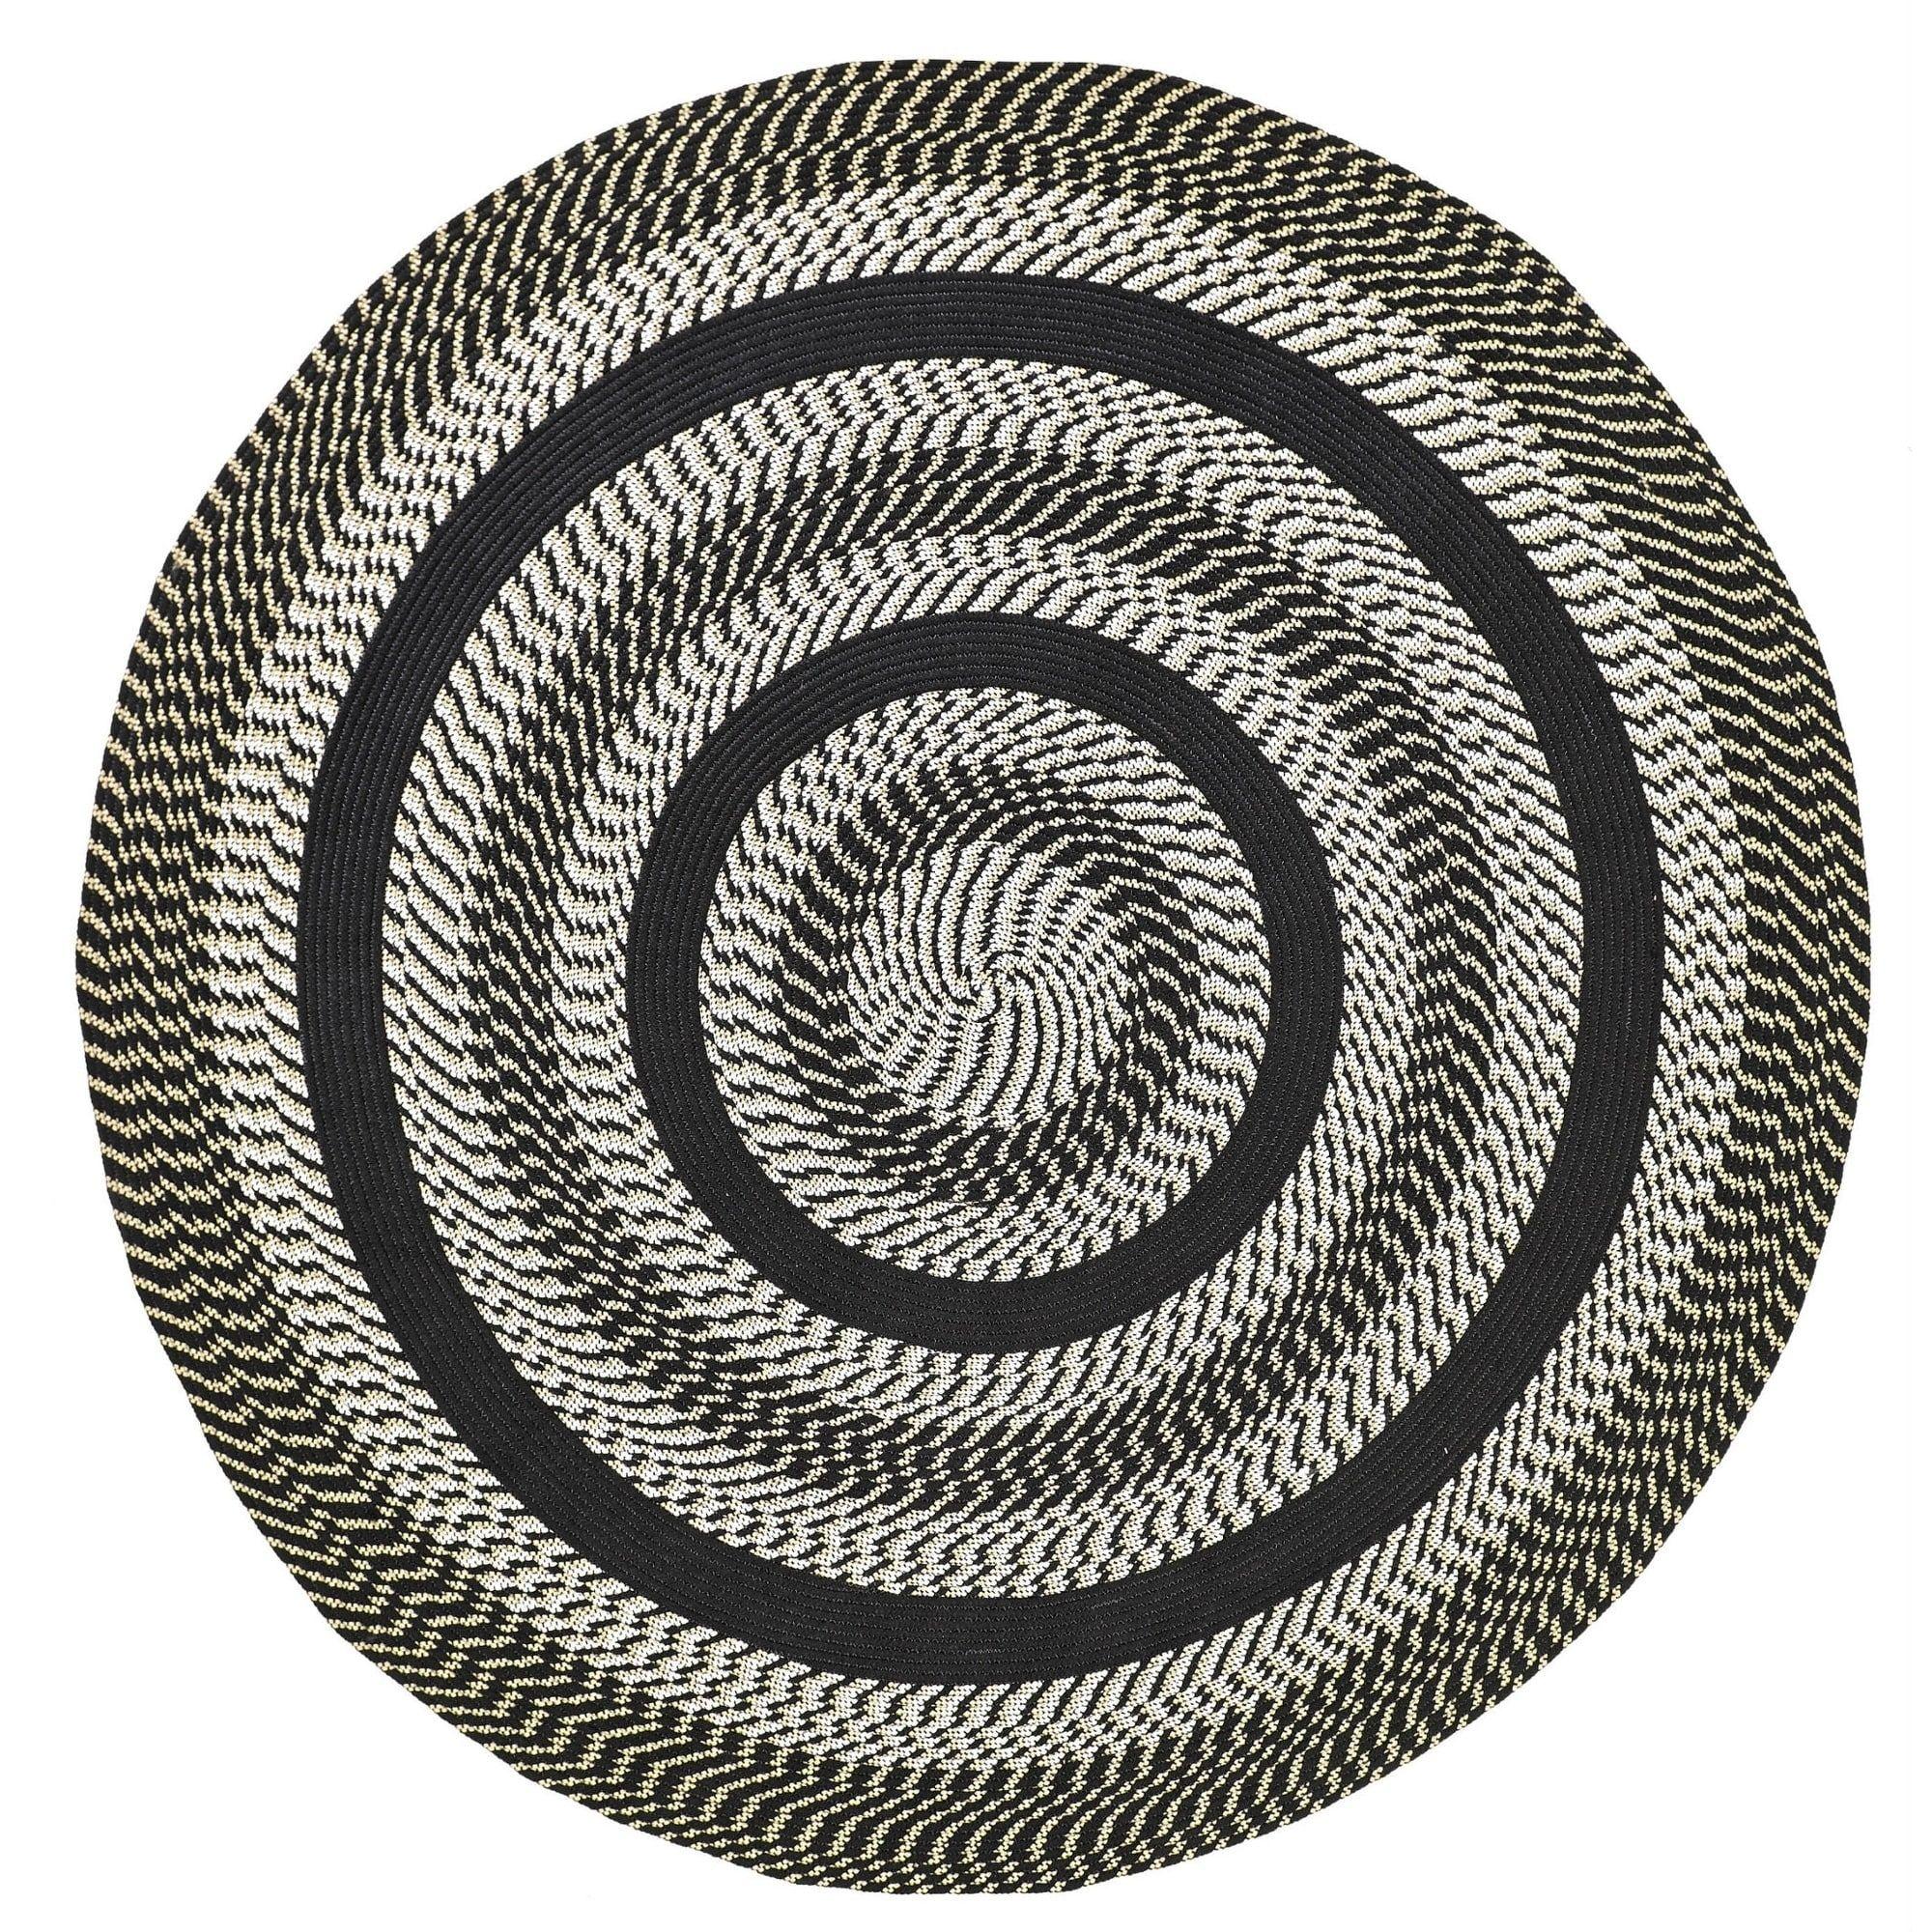 Better Trends Newport 6 Round Braided Rug Black Size Polypropylene